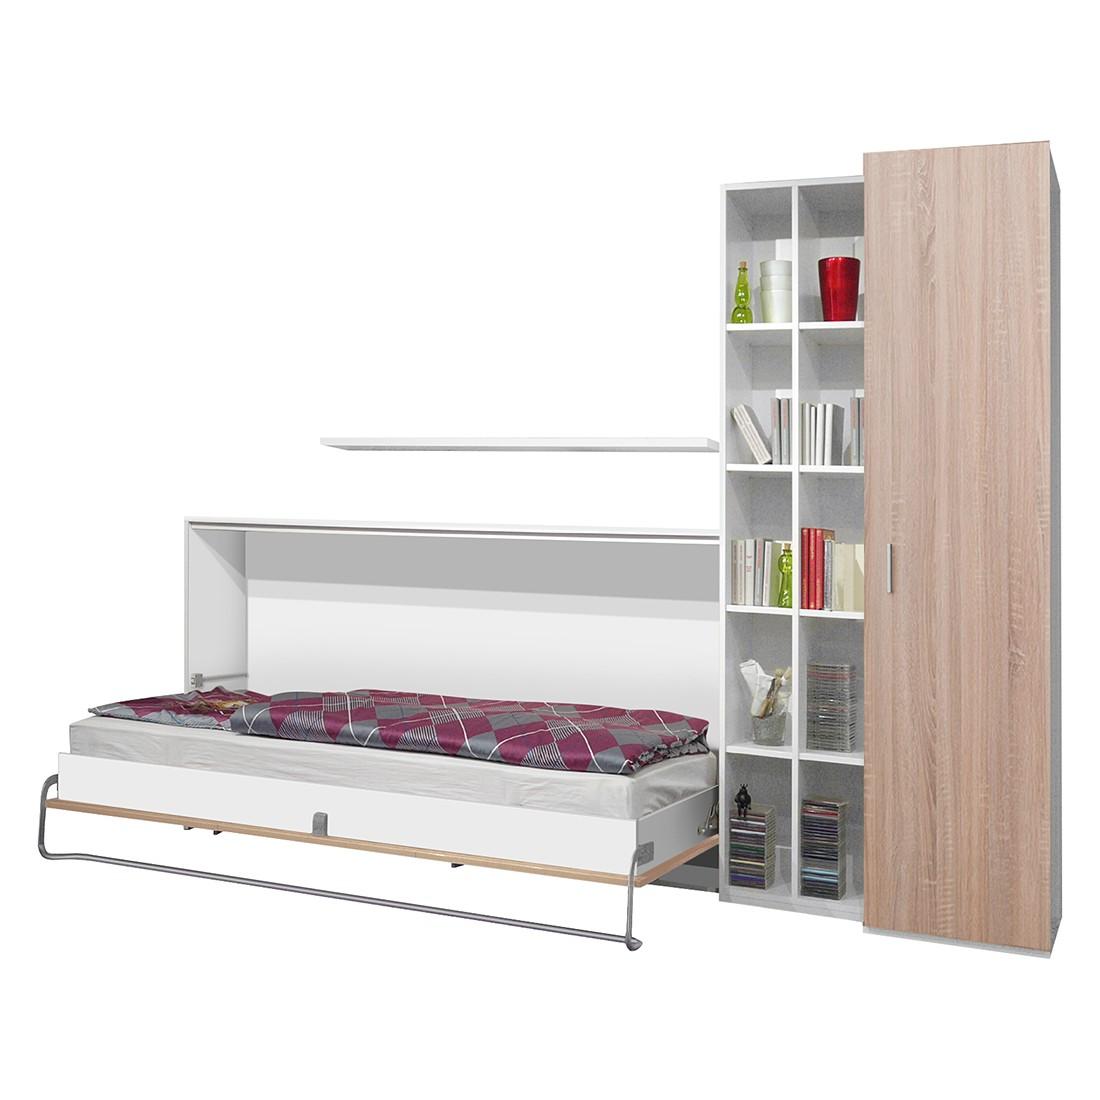 bett liegeh he 60 cm preisvergleiche erfahrungsberichte. Black Bedroom Furniture Sets. Home Design Ideas